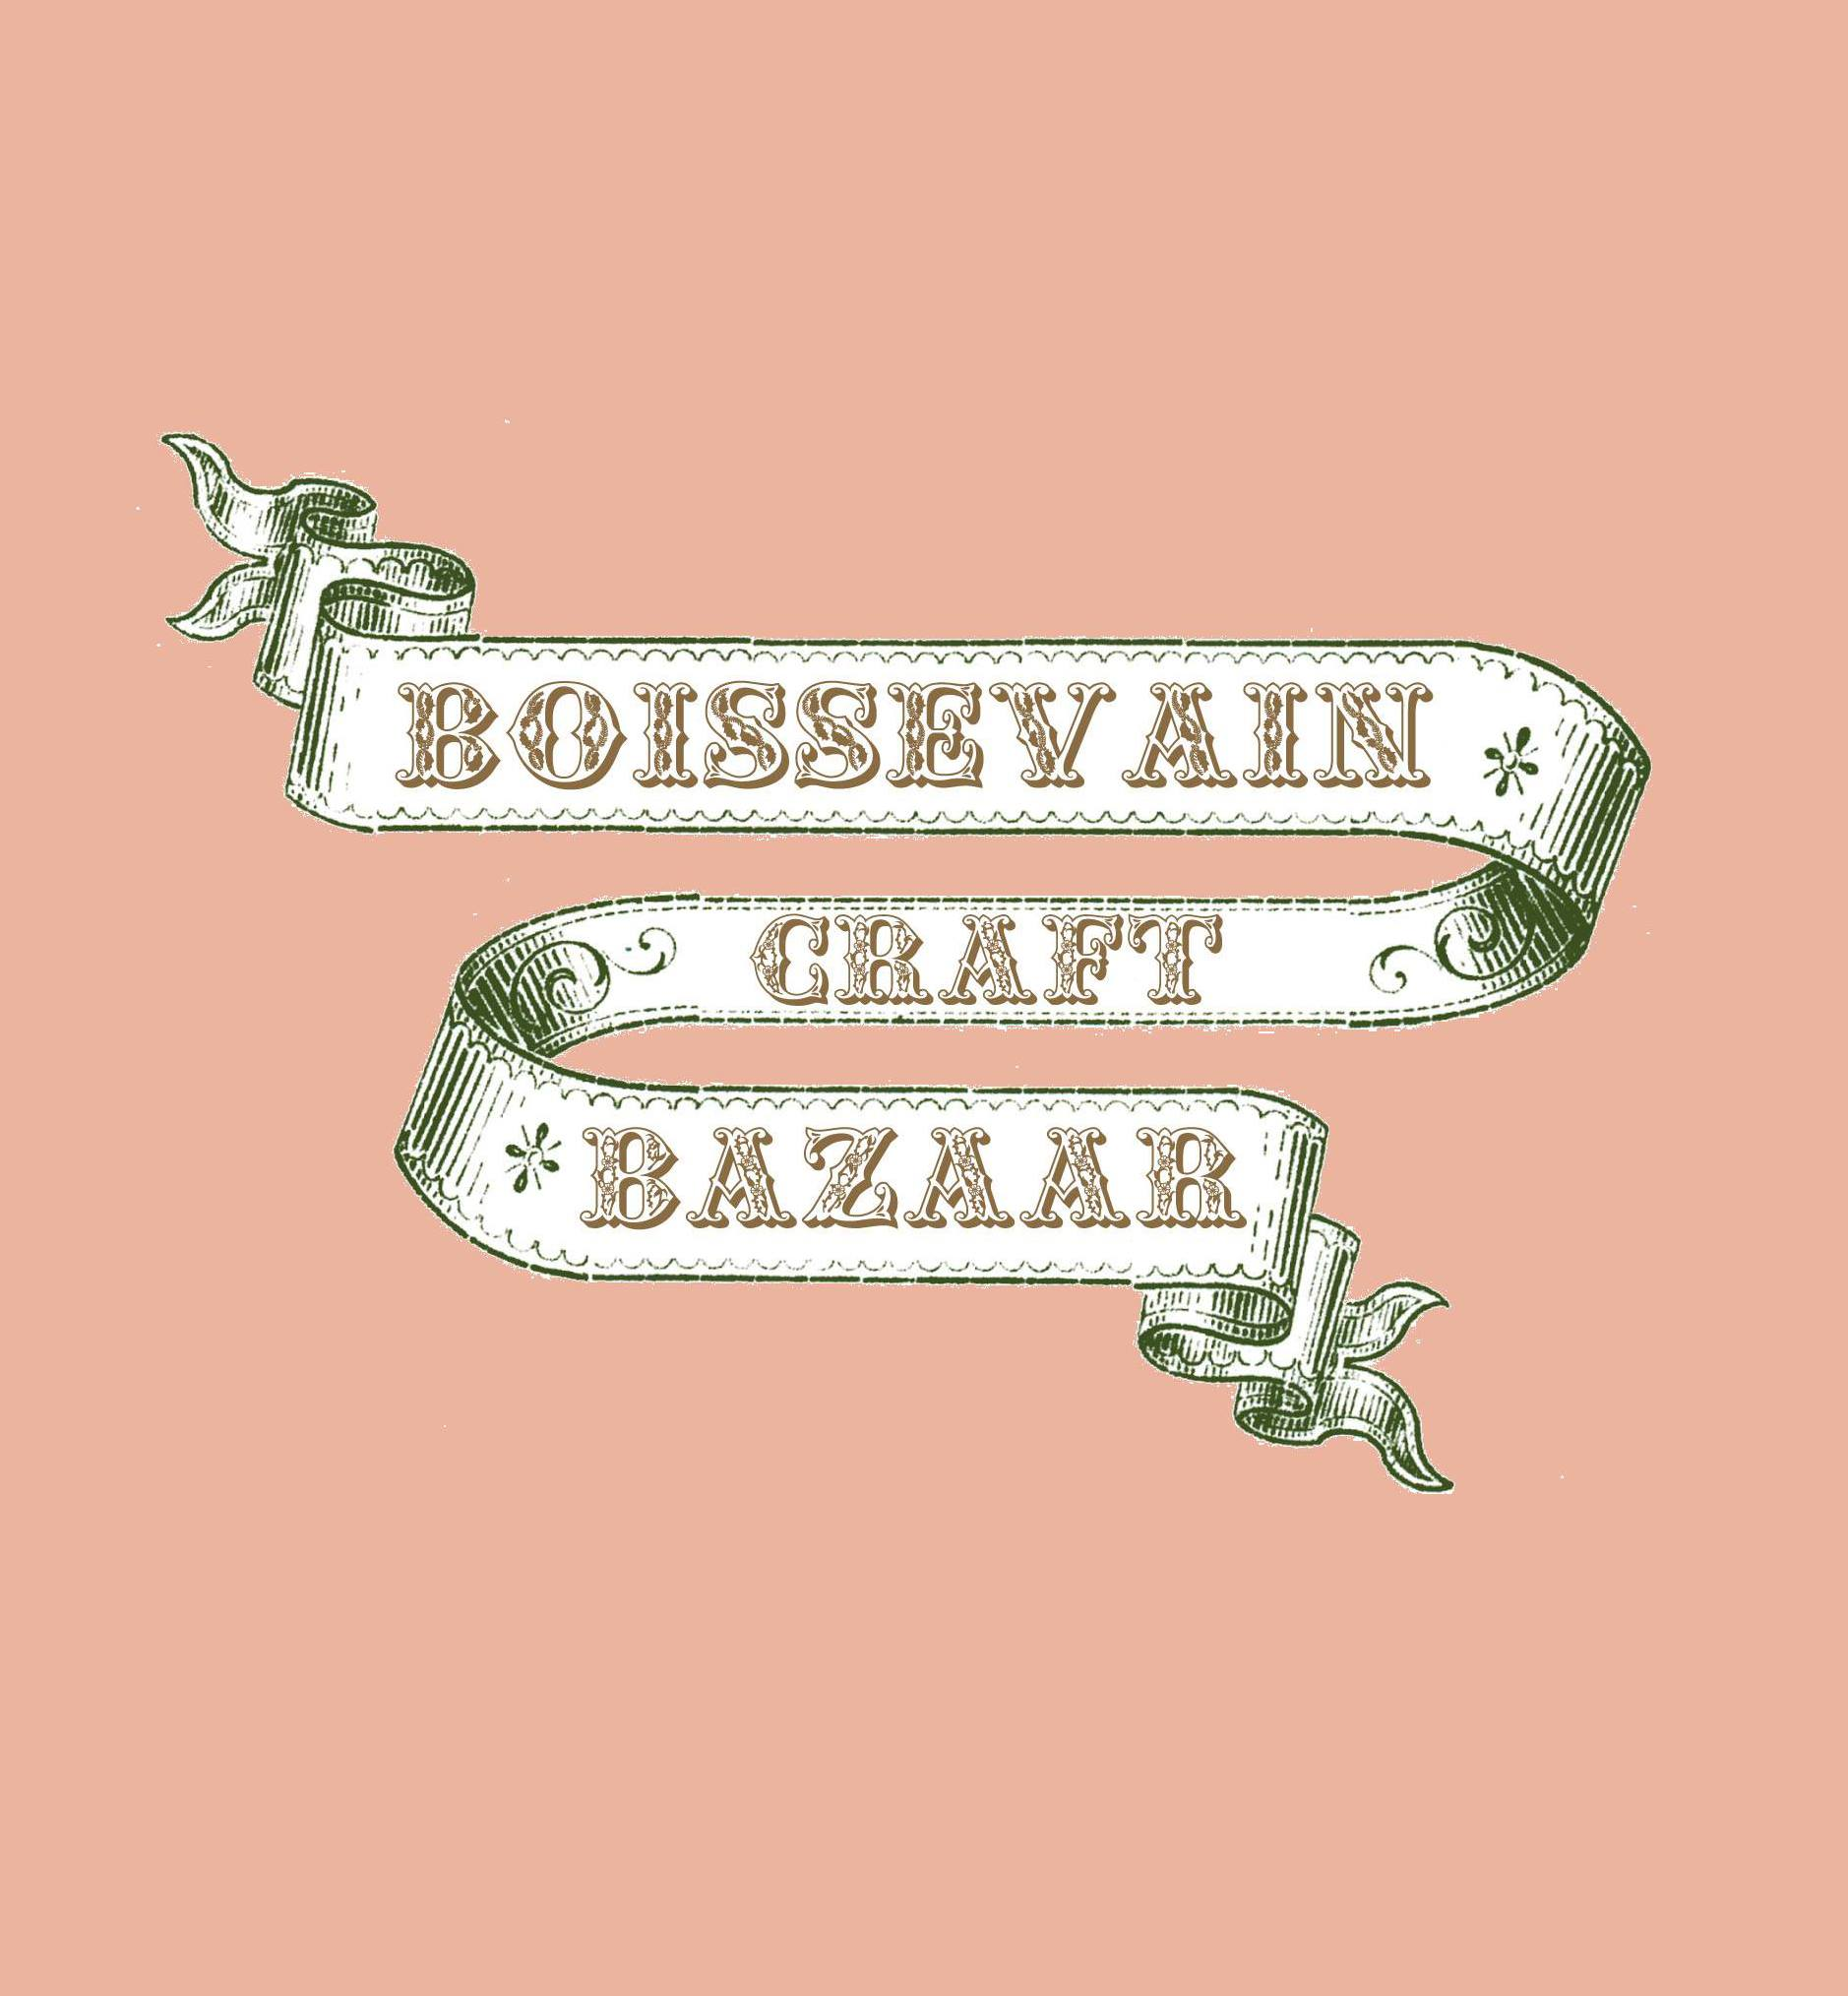 Boissevain Bazaar 2 May 2014